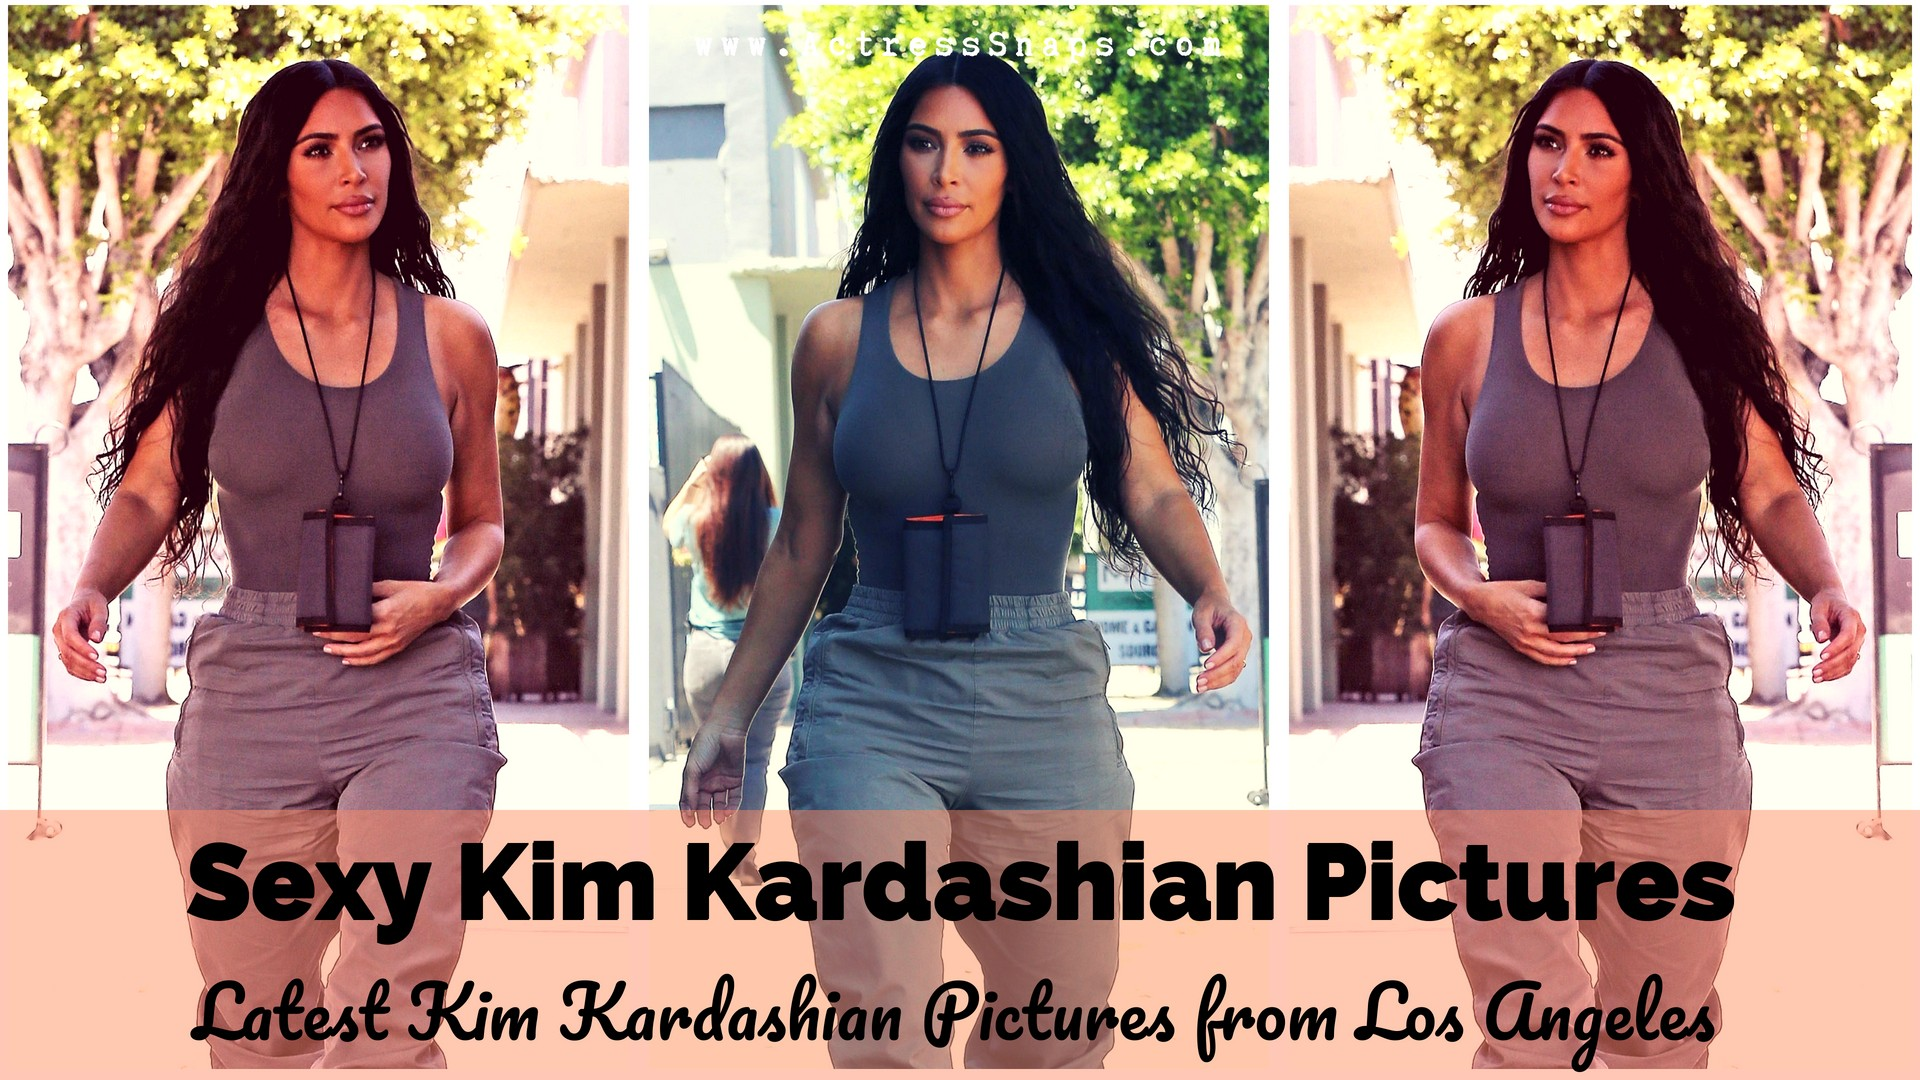 Latest Kim Kardashian Candid Pictures - Sexy Actress Pictures   Hot Actress Pictures - ActressSnaps.com